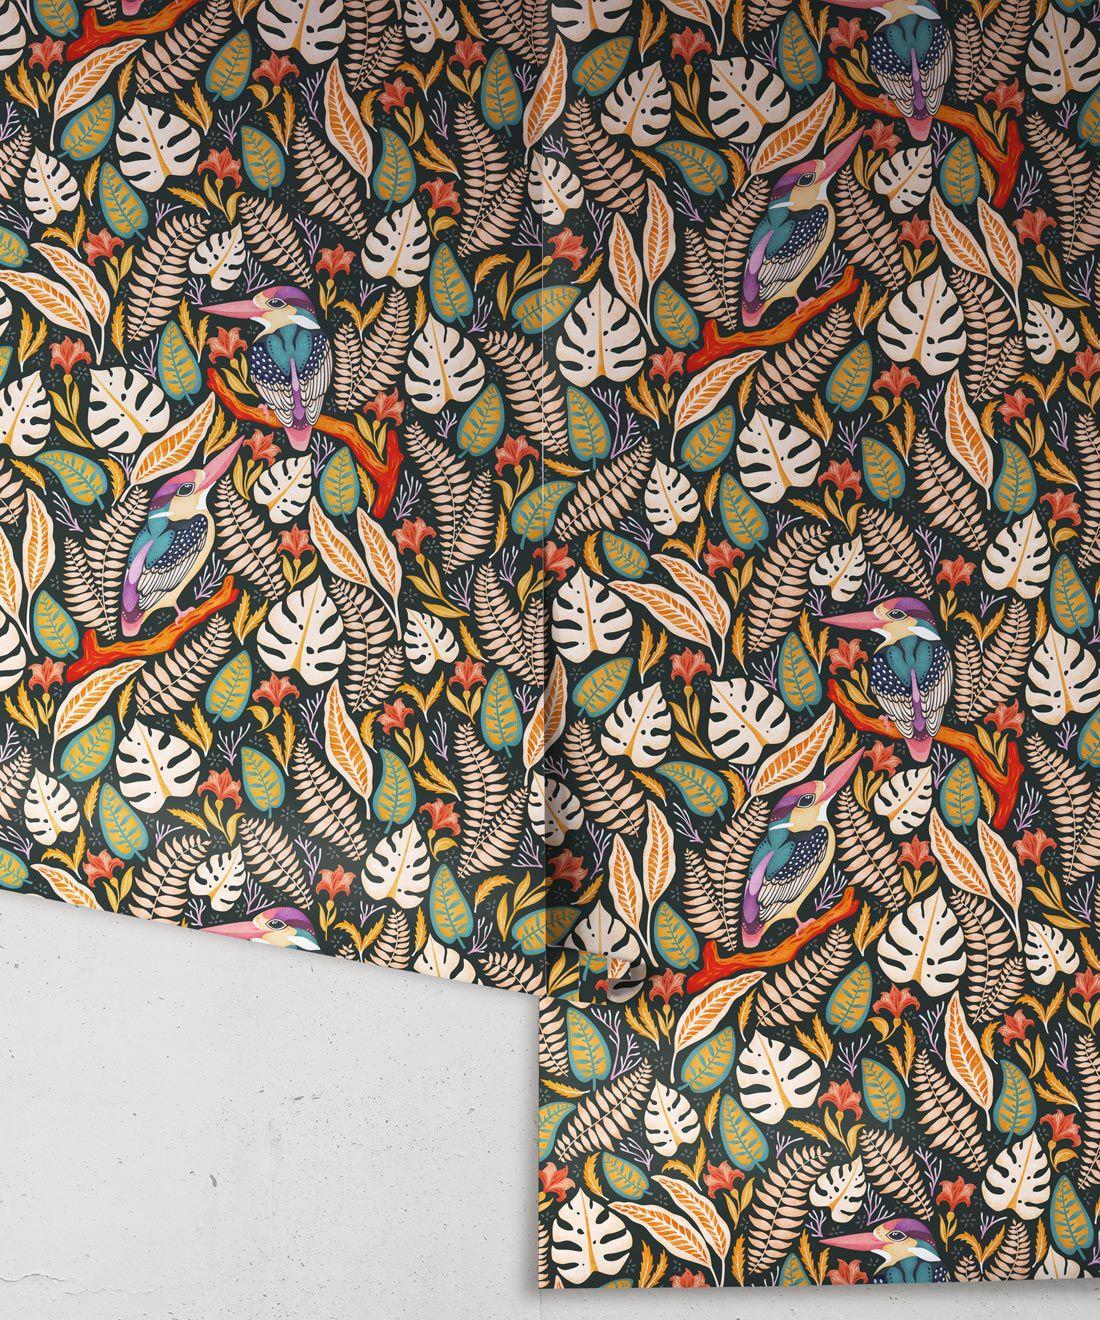 Kingfisher Wallpaper • Bird Wallpaper • Autumn Color Wallpaper Rolls